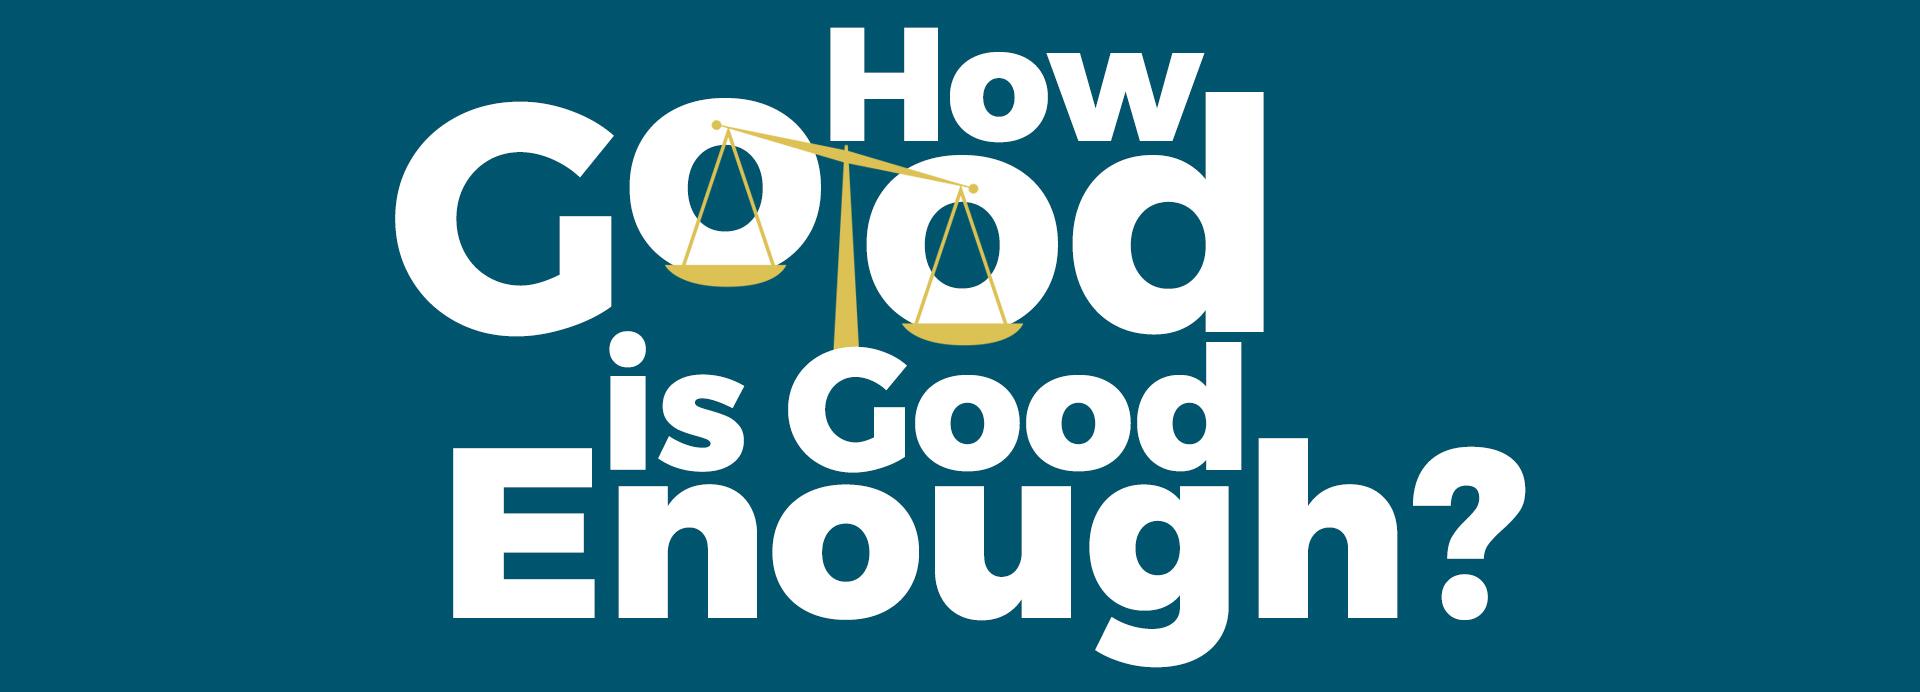 How Good is Good Enough (1920x692).jpg